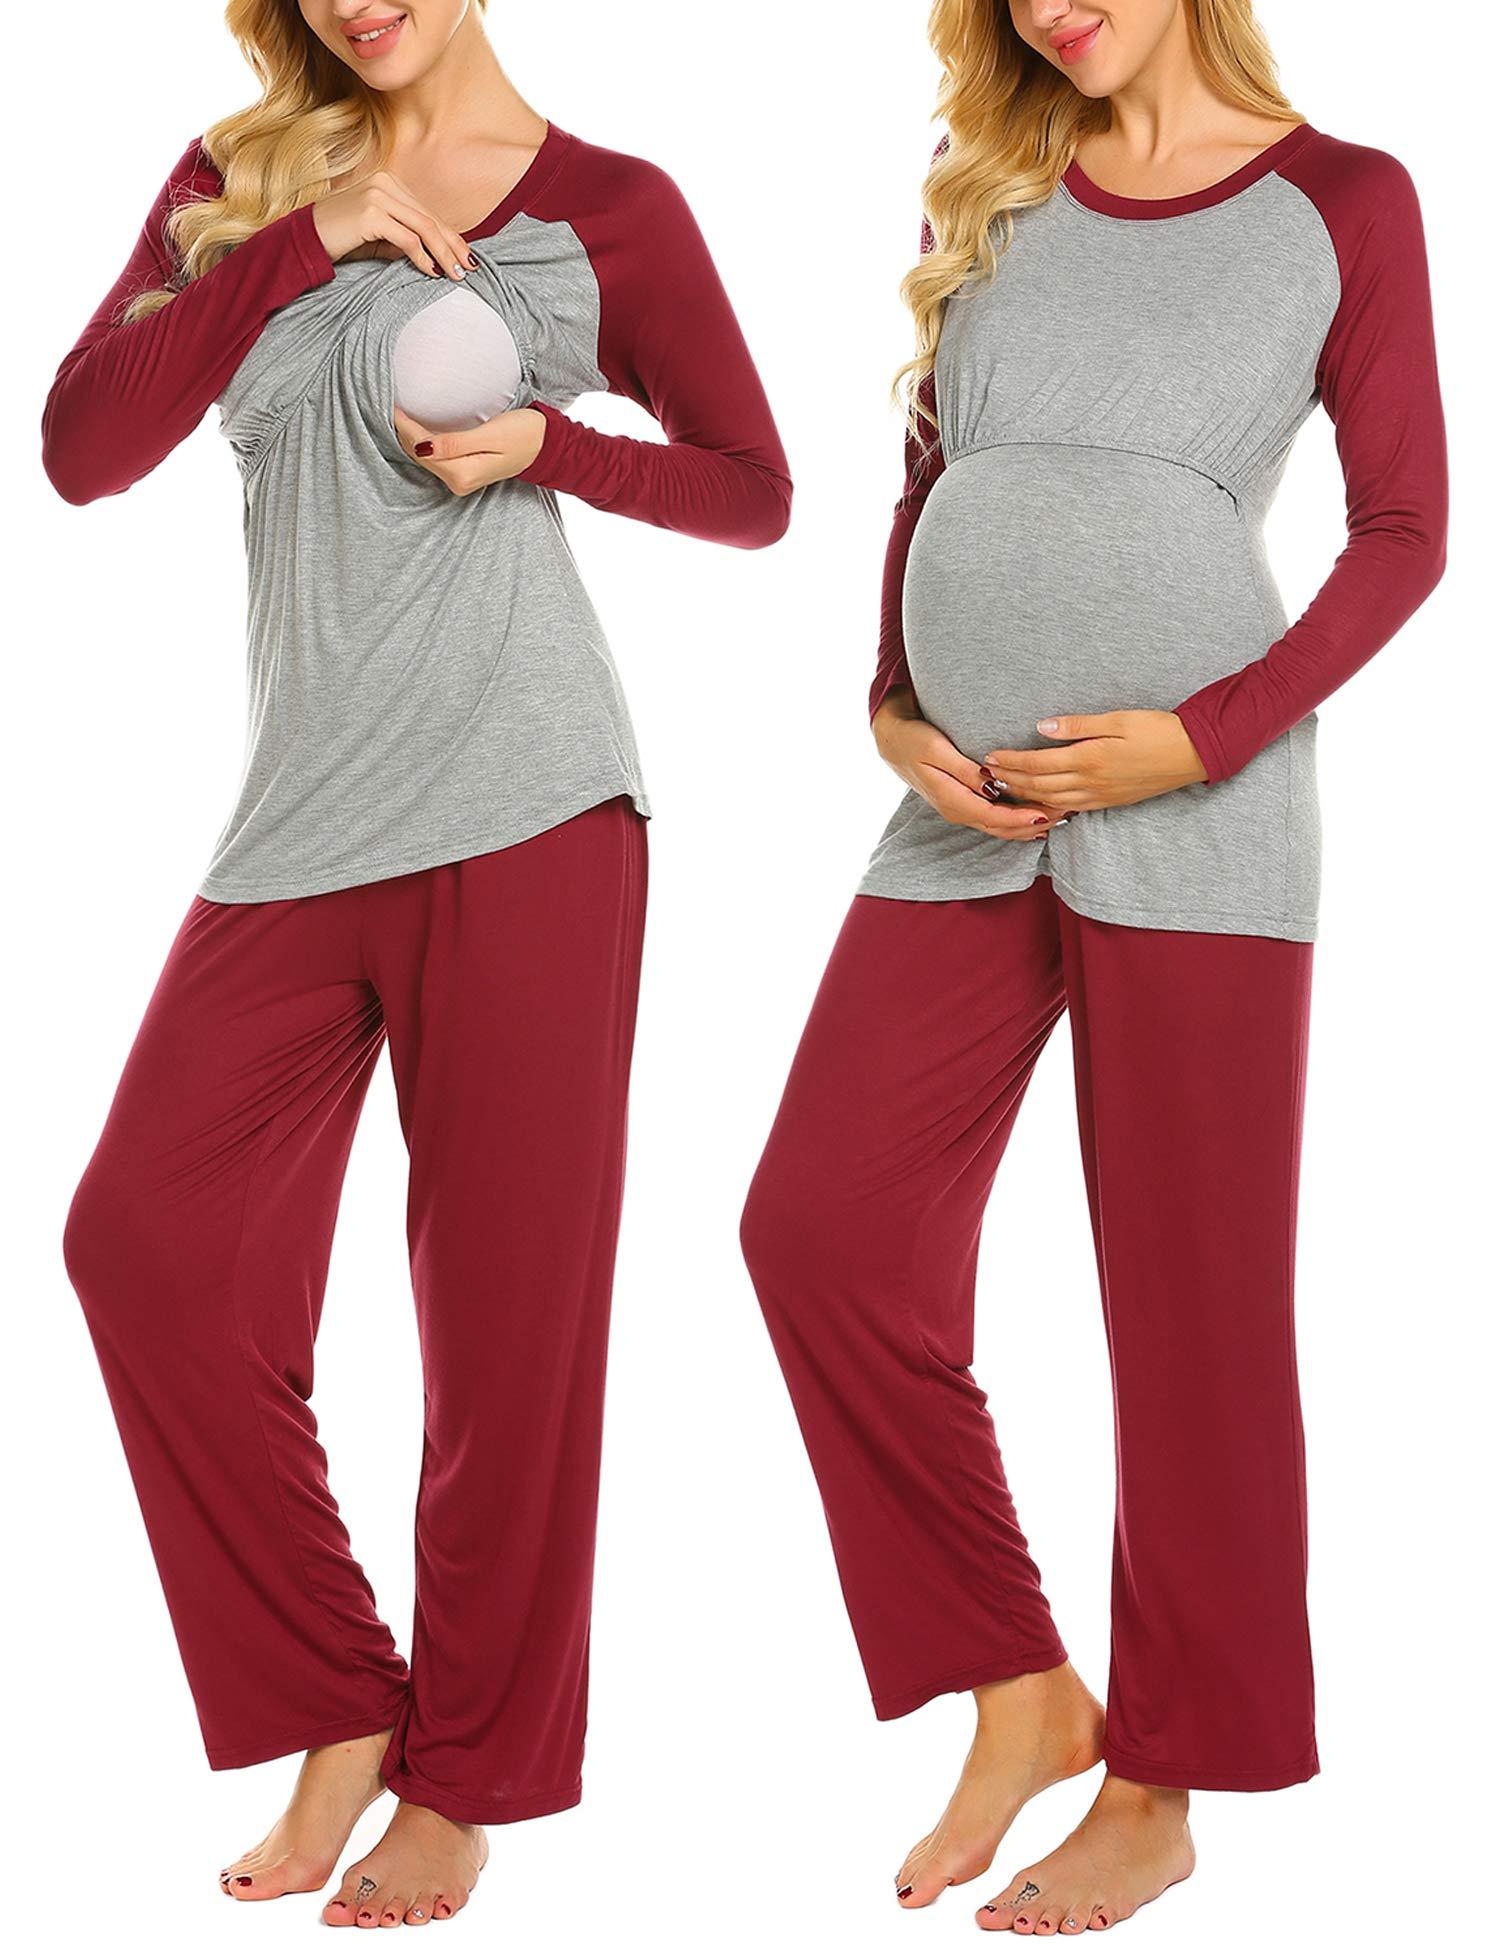 Ekouaer Cotton Maternity Loungewear Nursing Pajama Pants Set (Wine Red XXL)